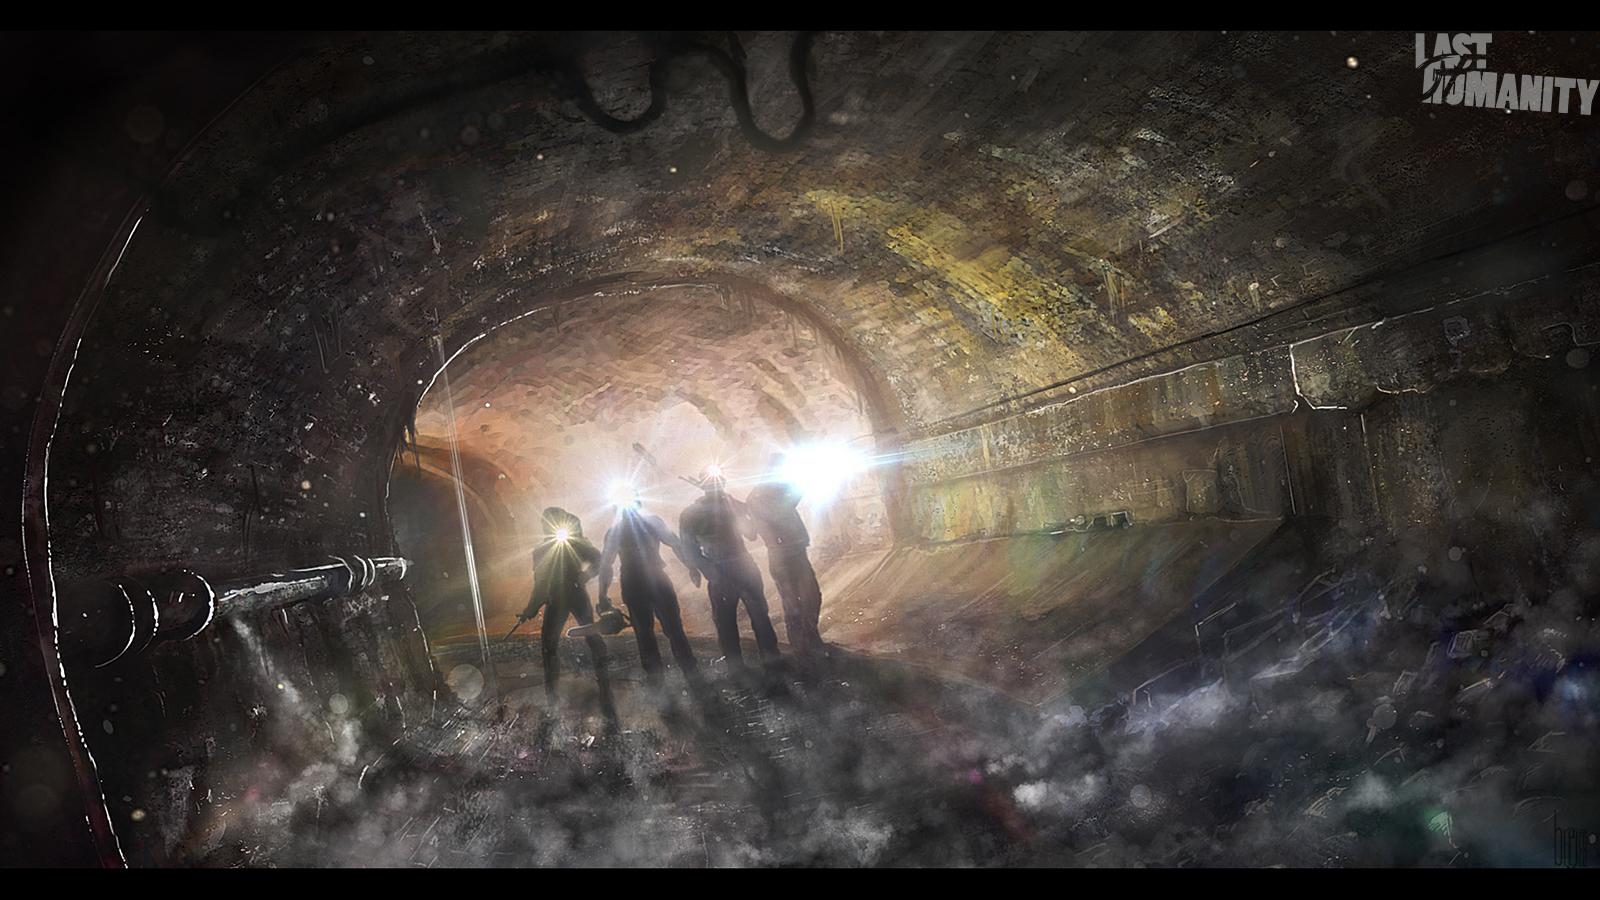 sewers calm